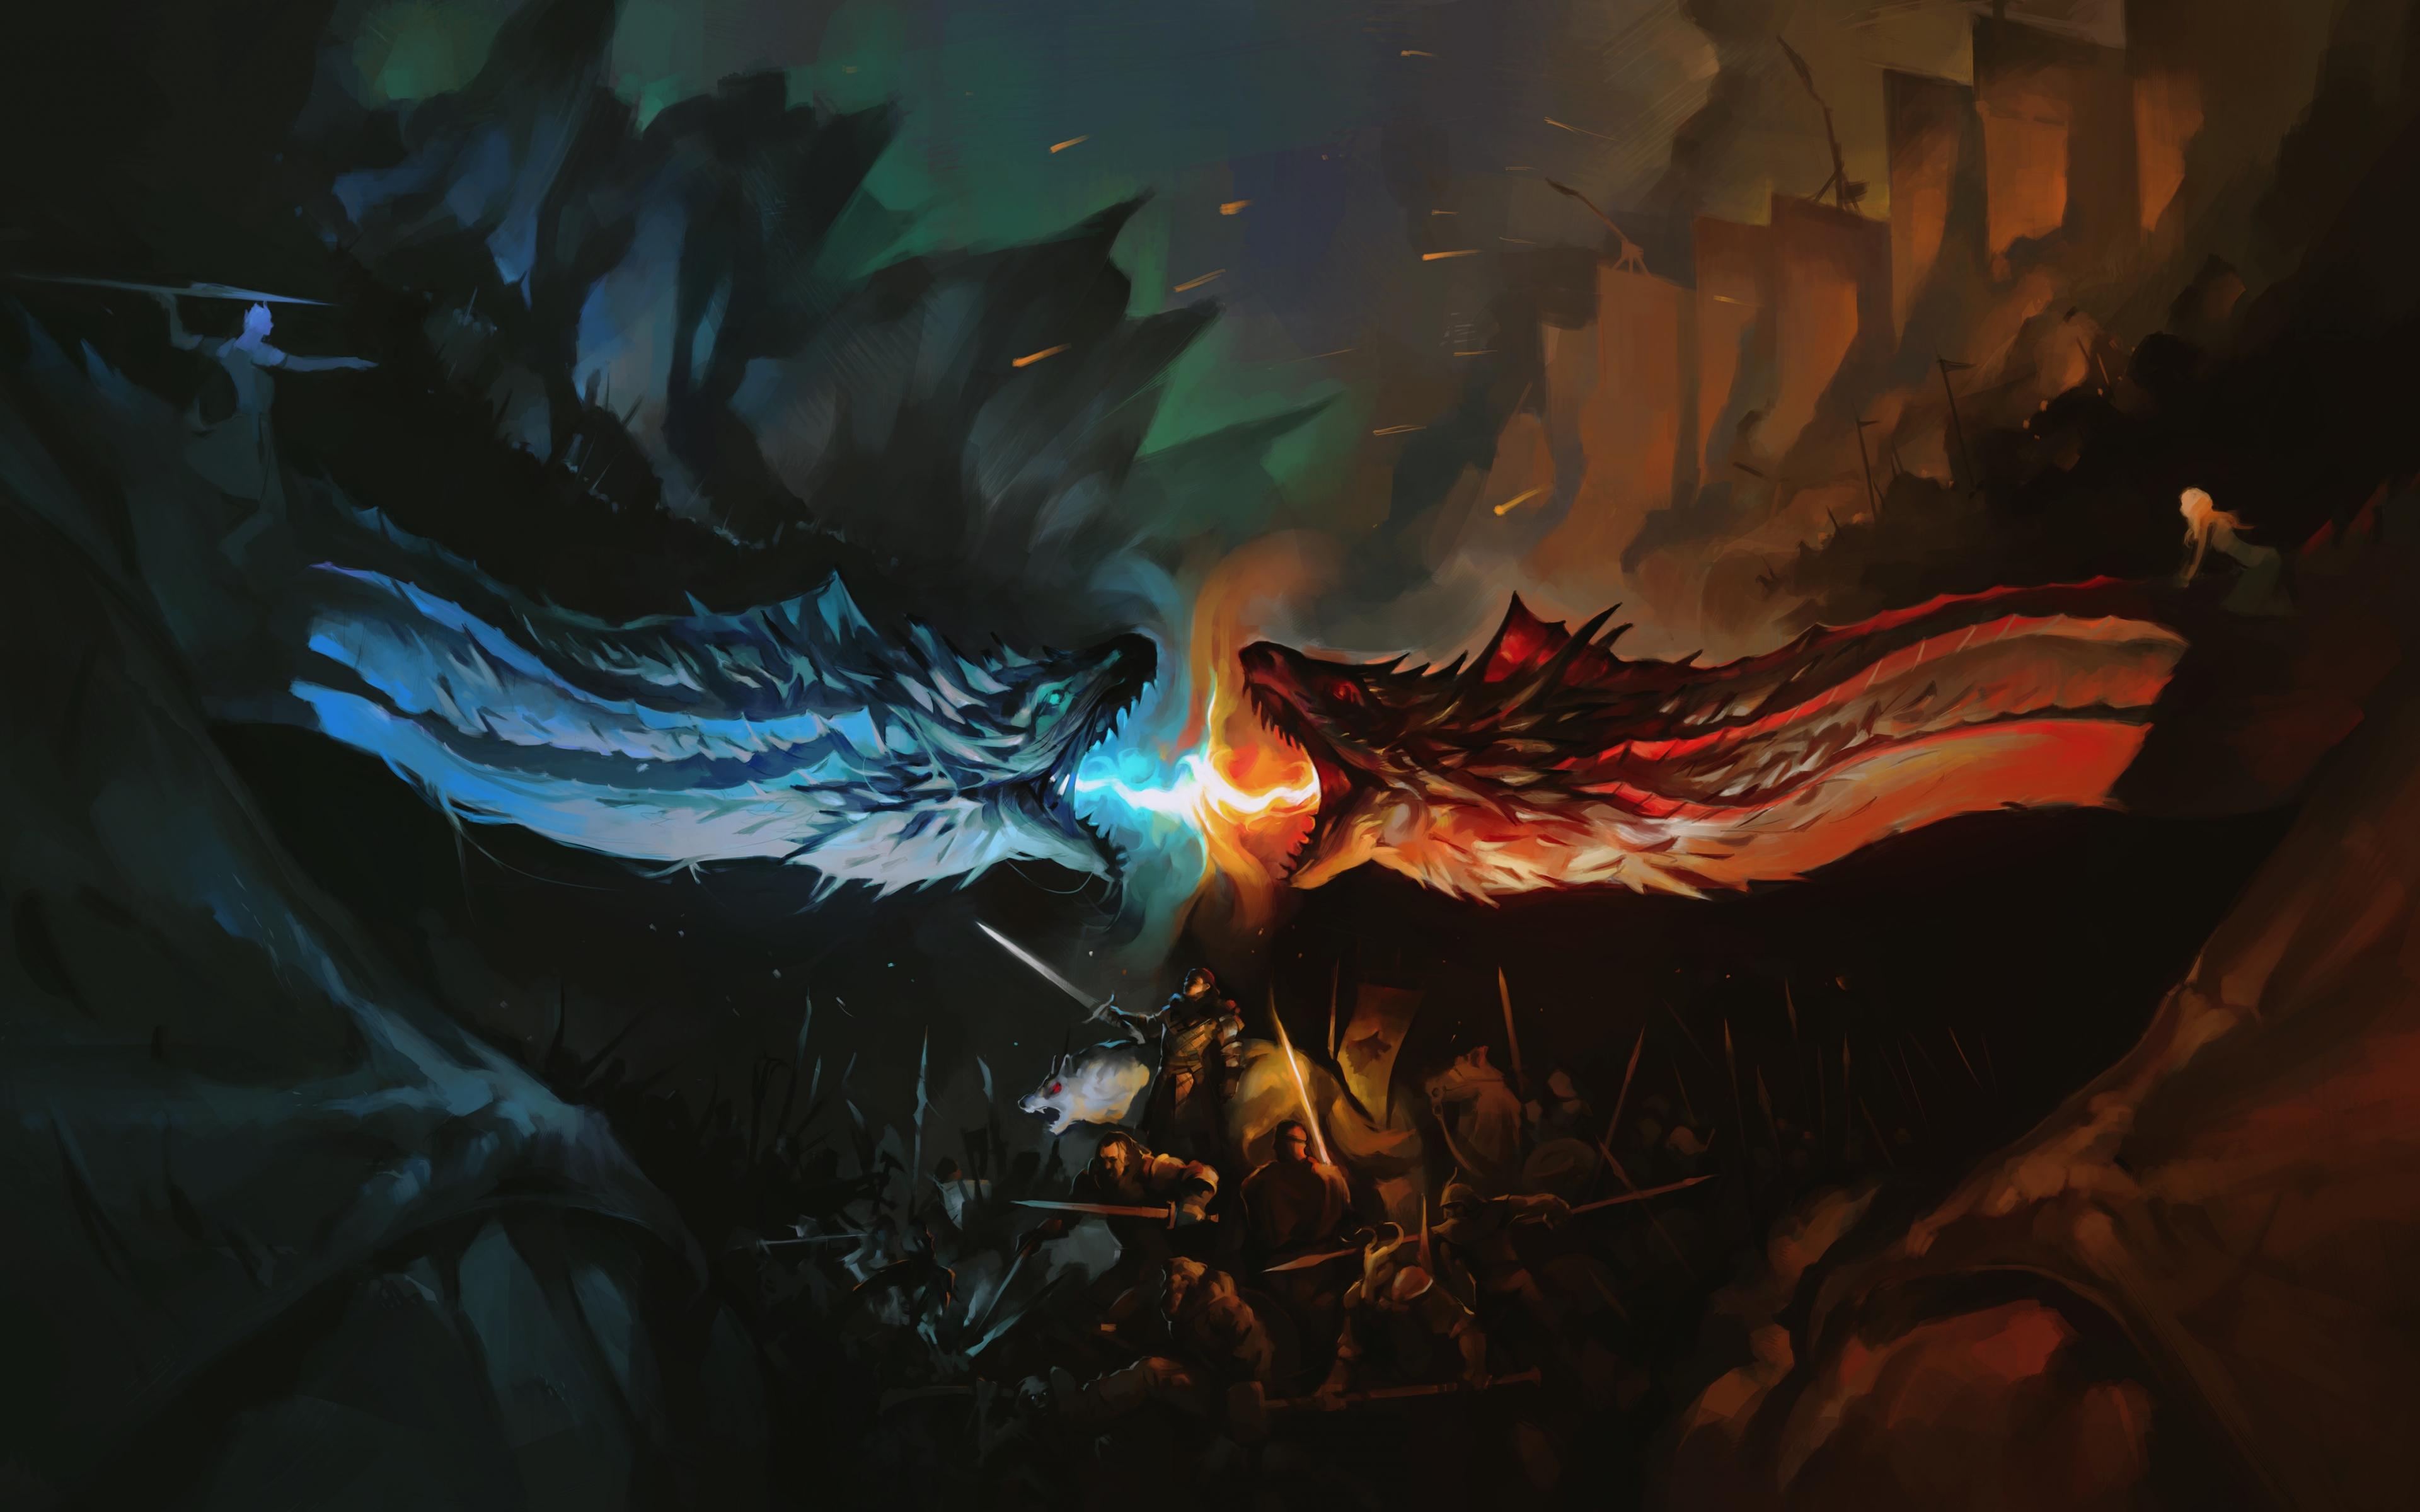 Download 3840x2400 Wallpaper Game Of Thrones, Tv Series